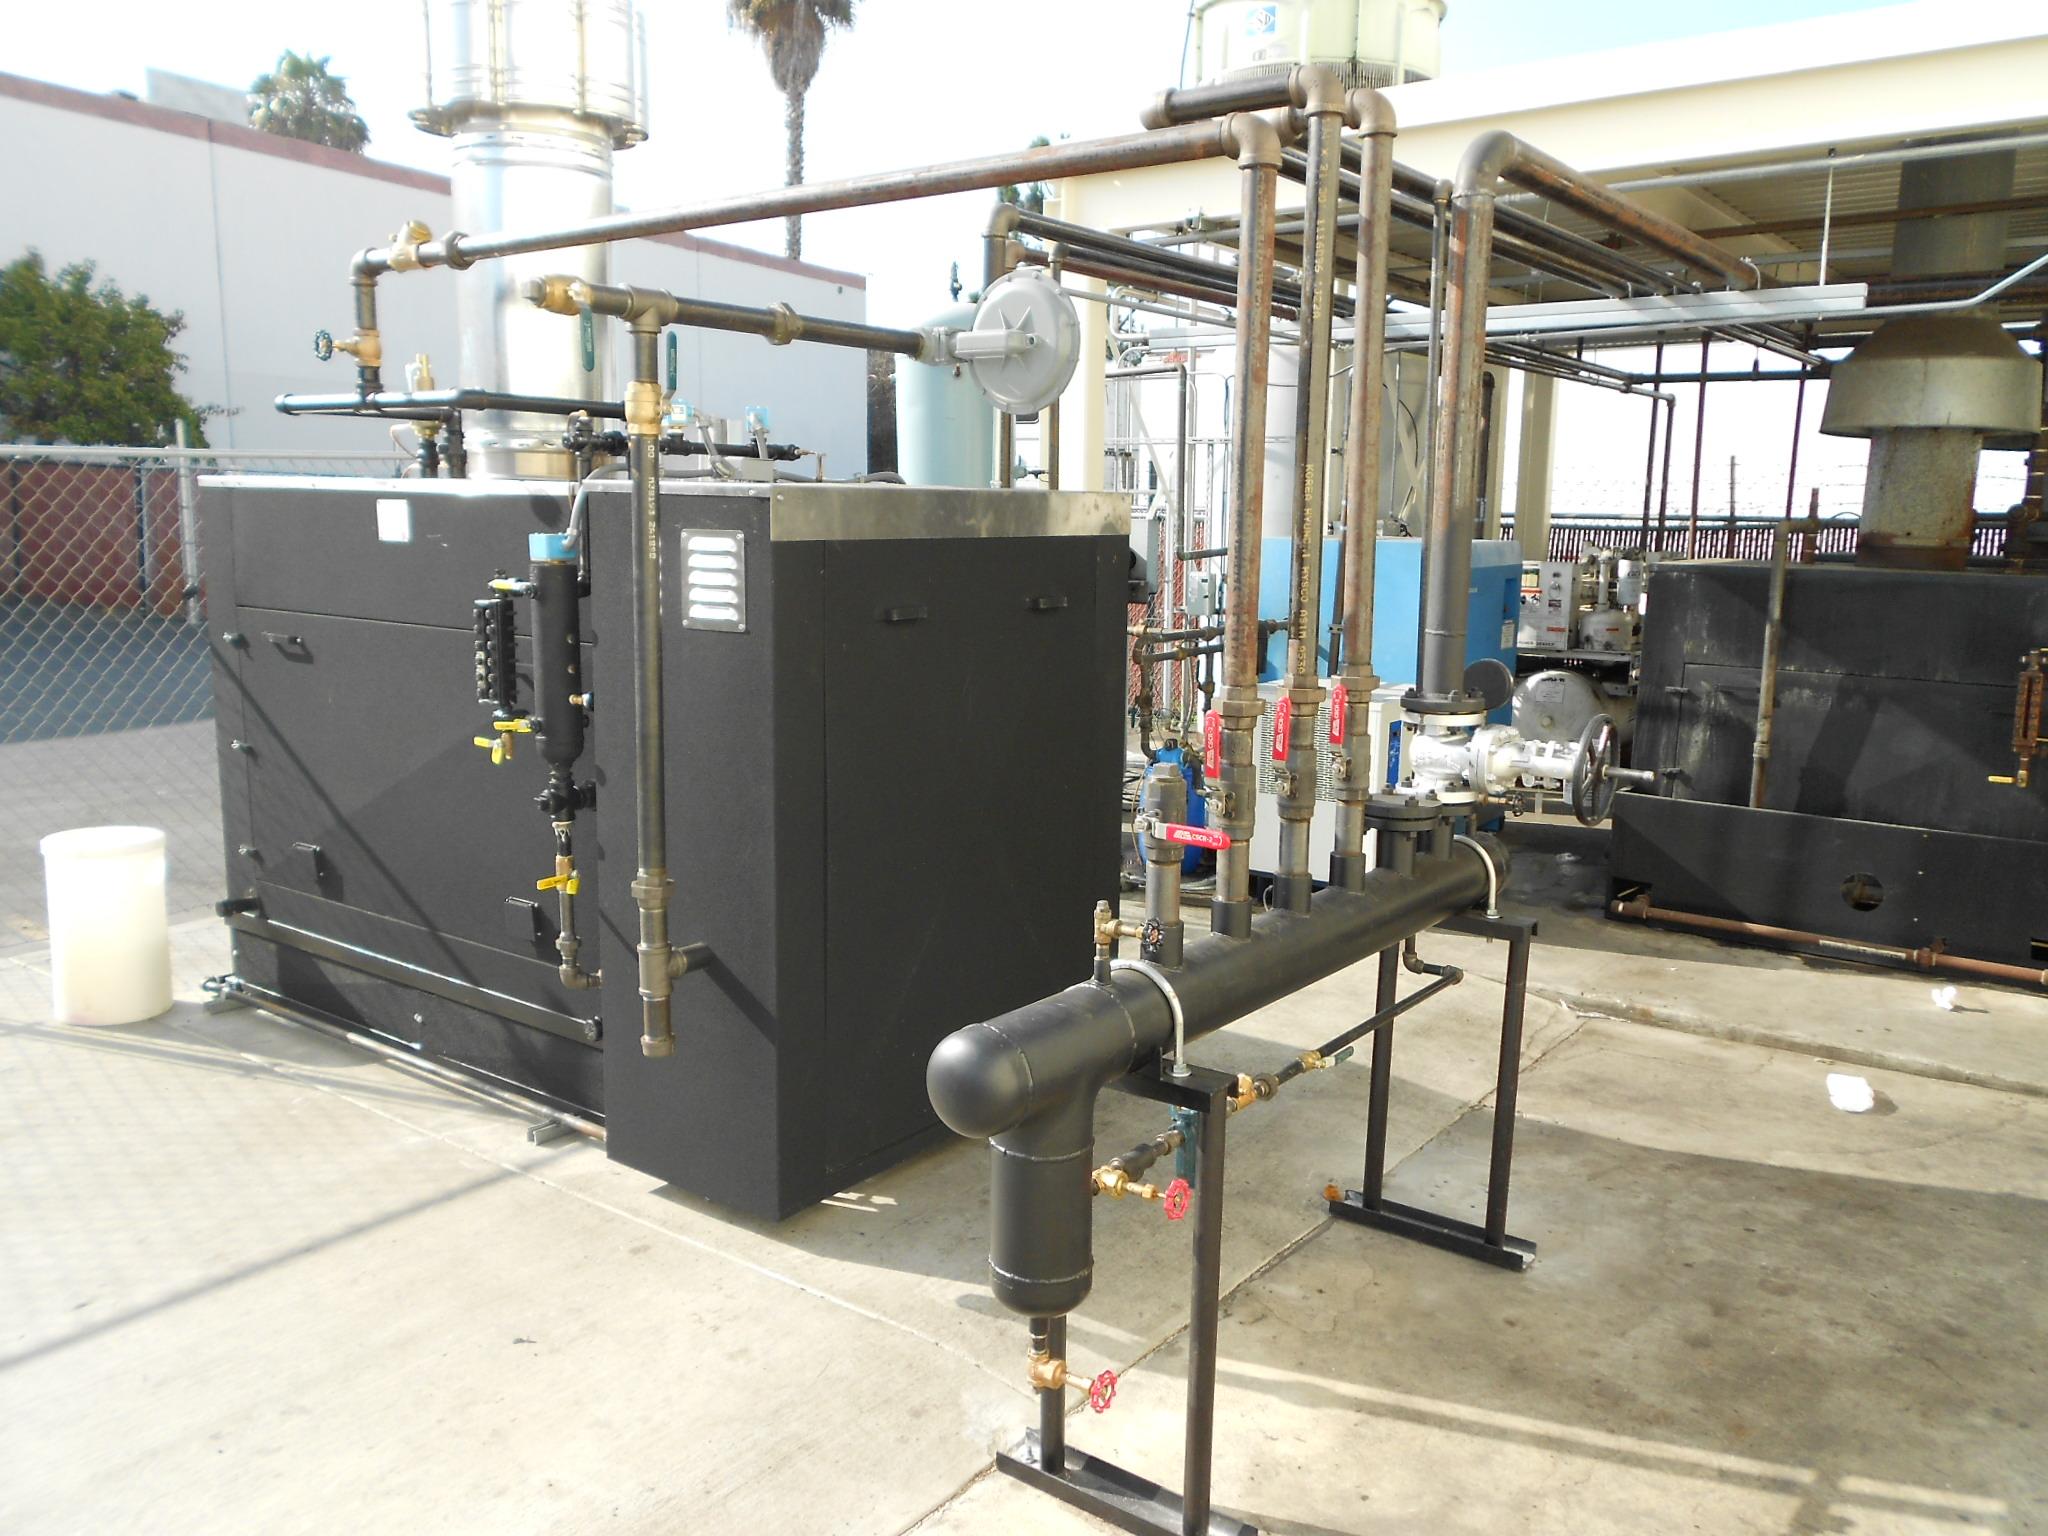 Steam Boiler Installation Free Download Ajax Wiring Diagram Porter Service At